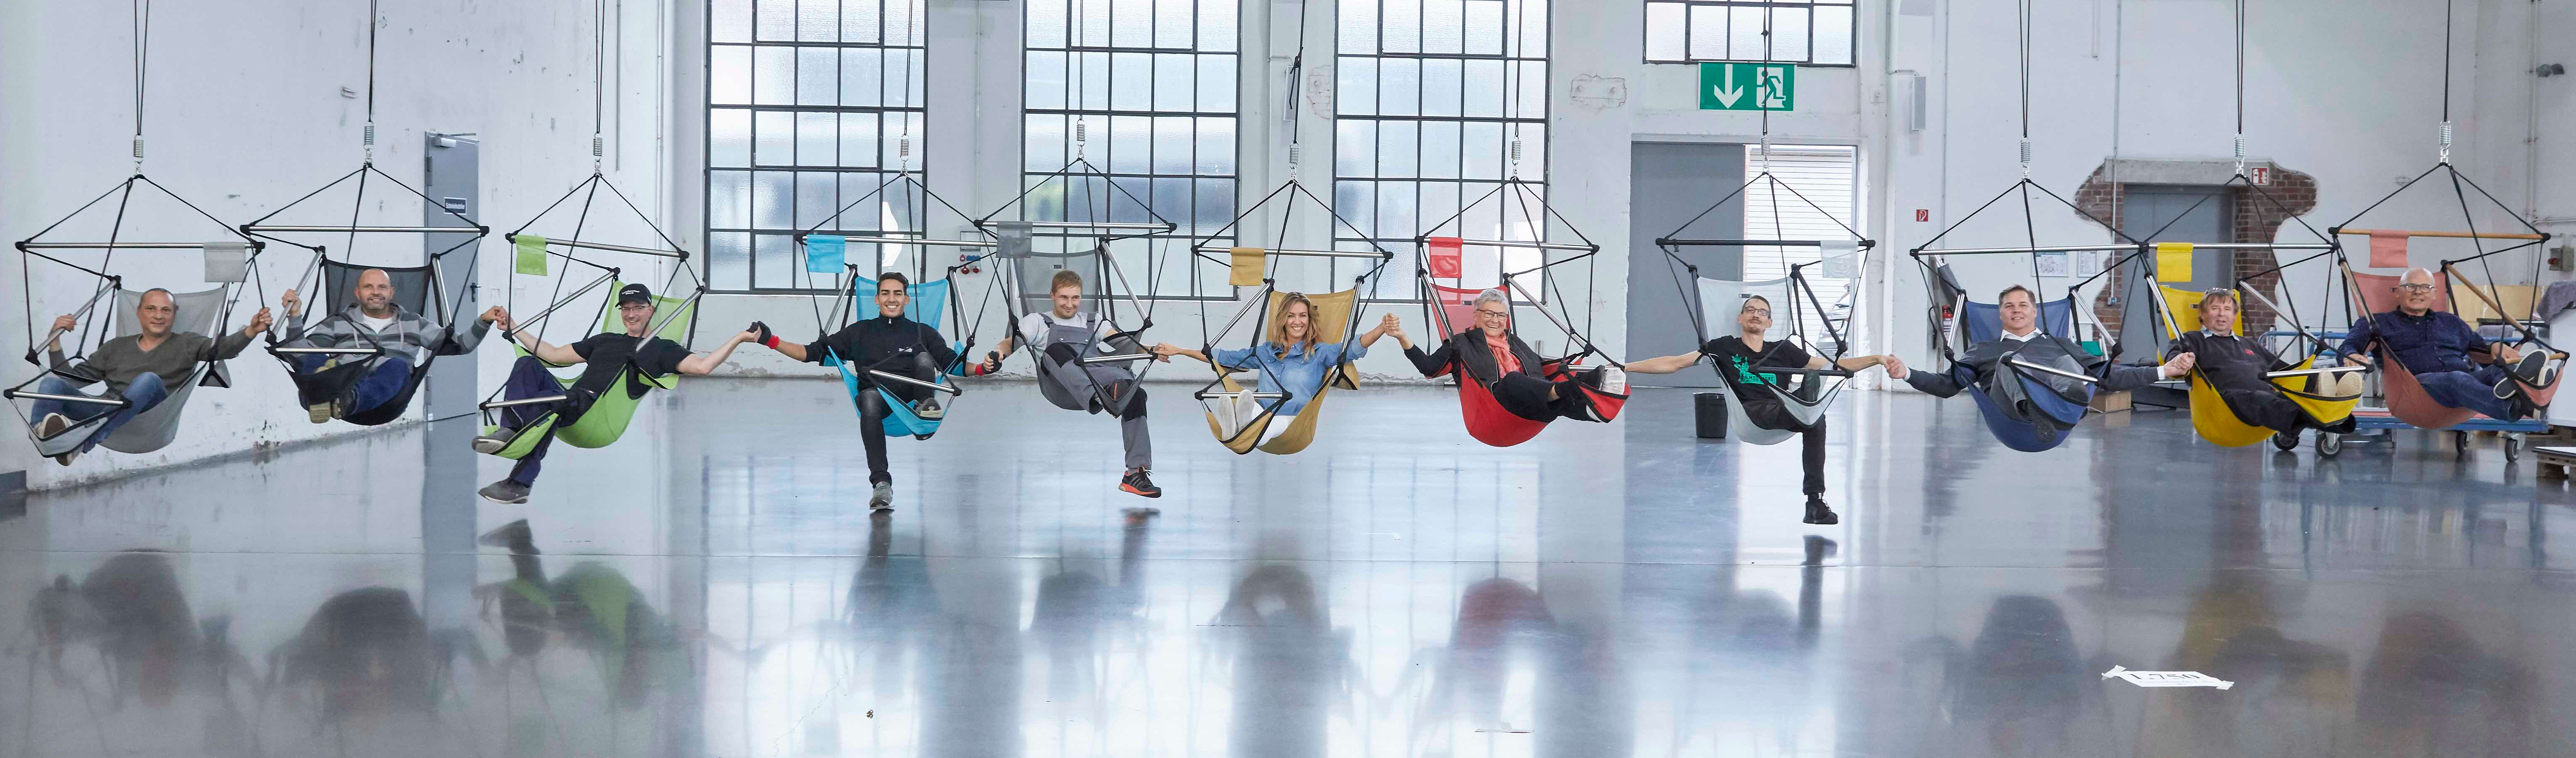 Pimiento OHG – Crazy Chair